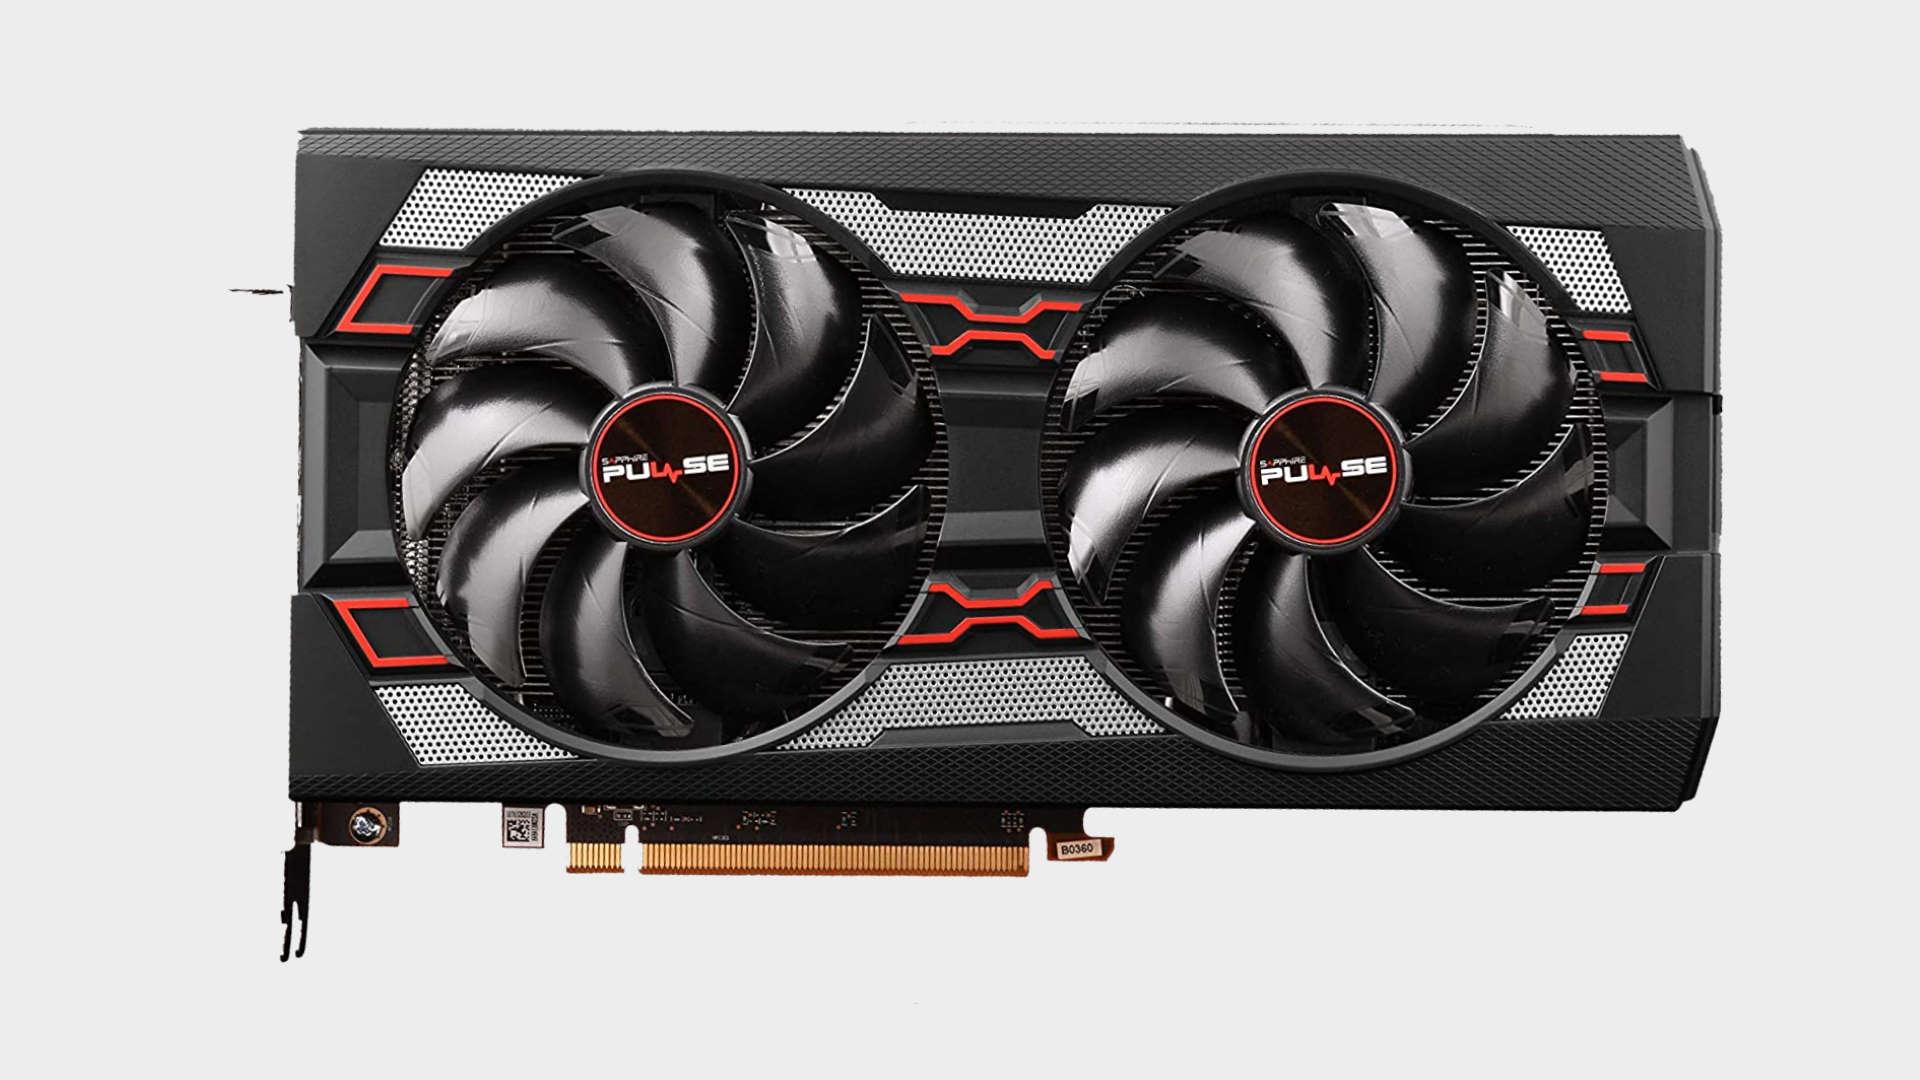 Sapphire's AMD Radeon RX 5600 XT